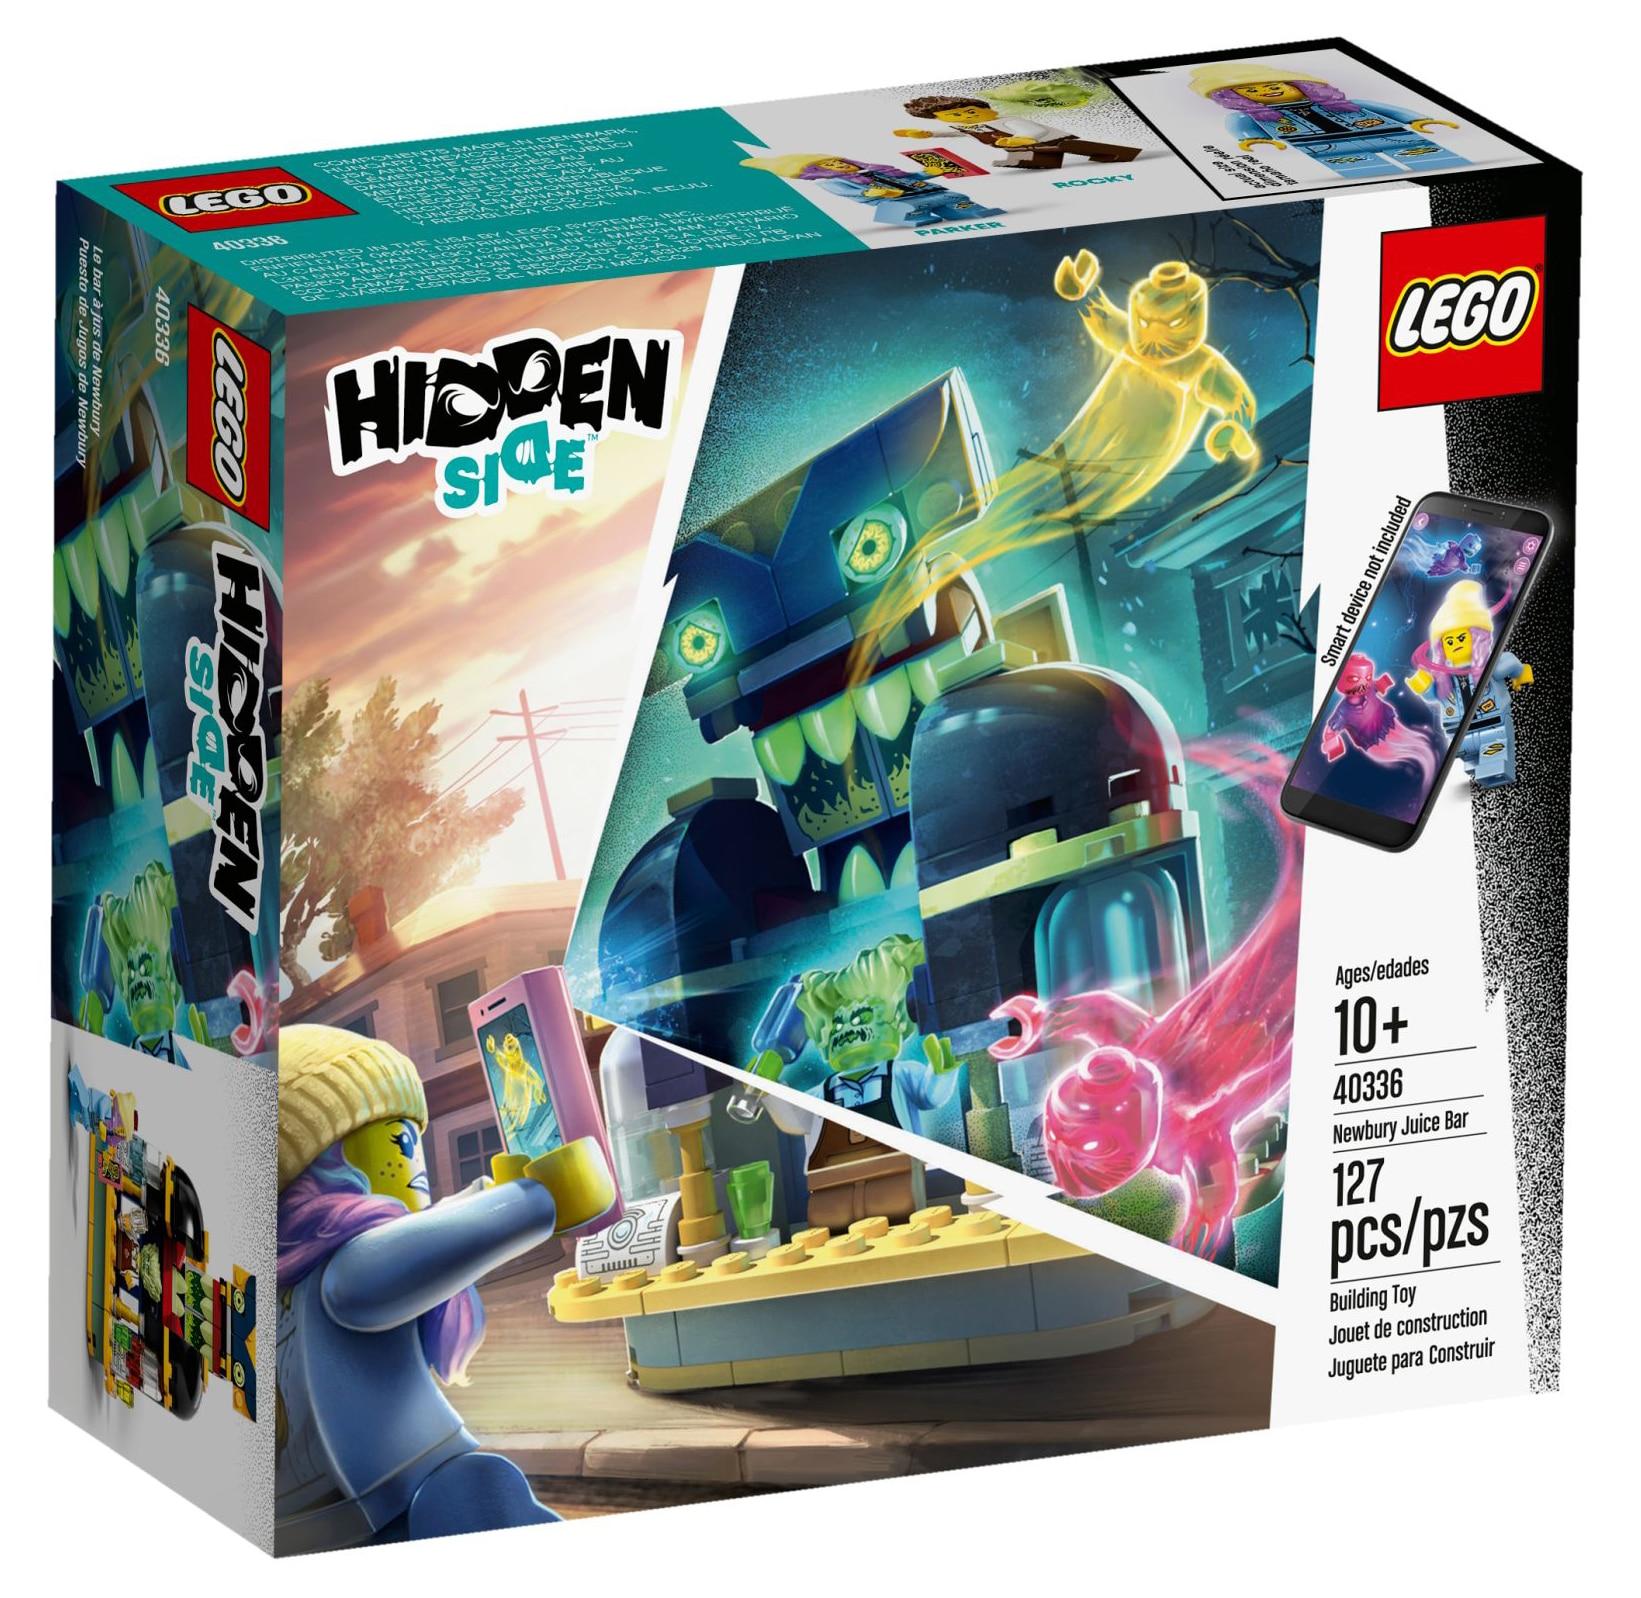 LEGO 40336 Newburrys Saftbar Box